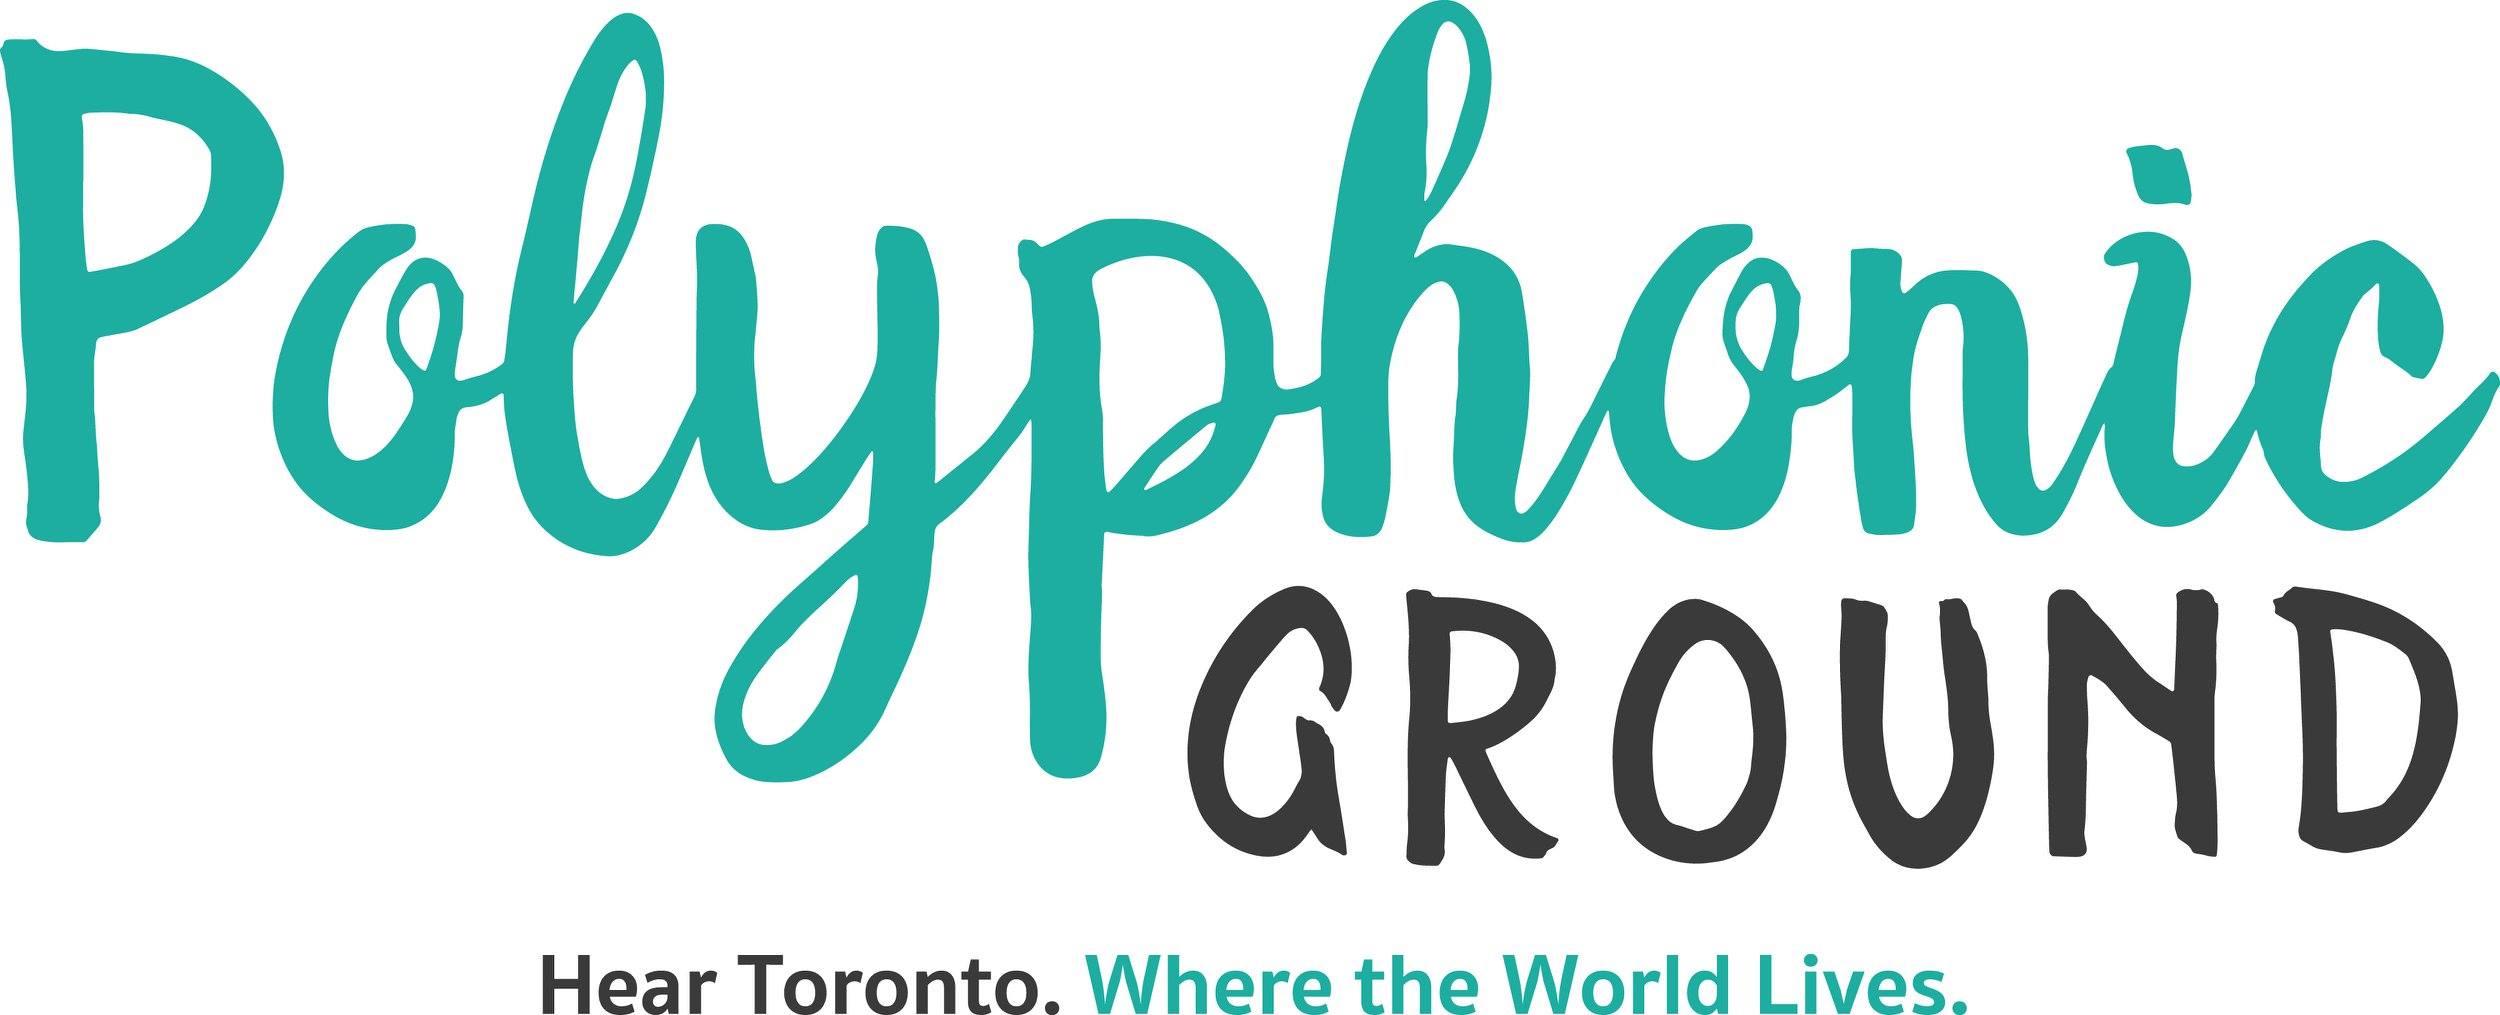 Polyphonic-Ground-logo